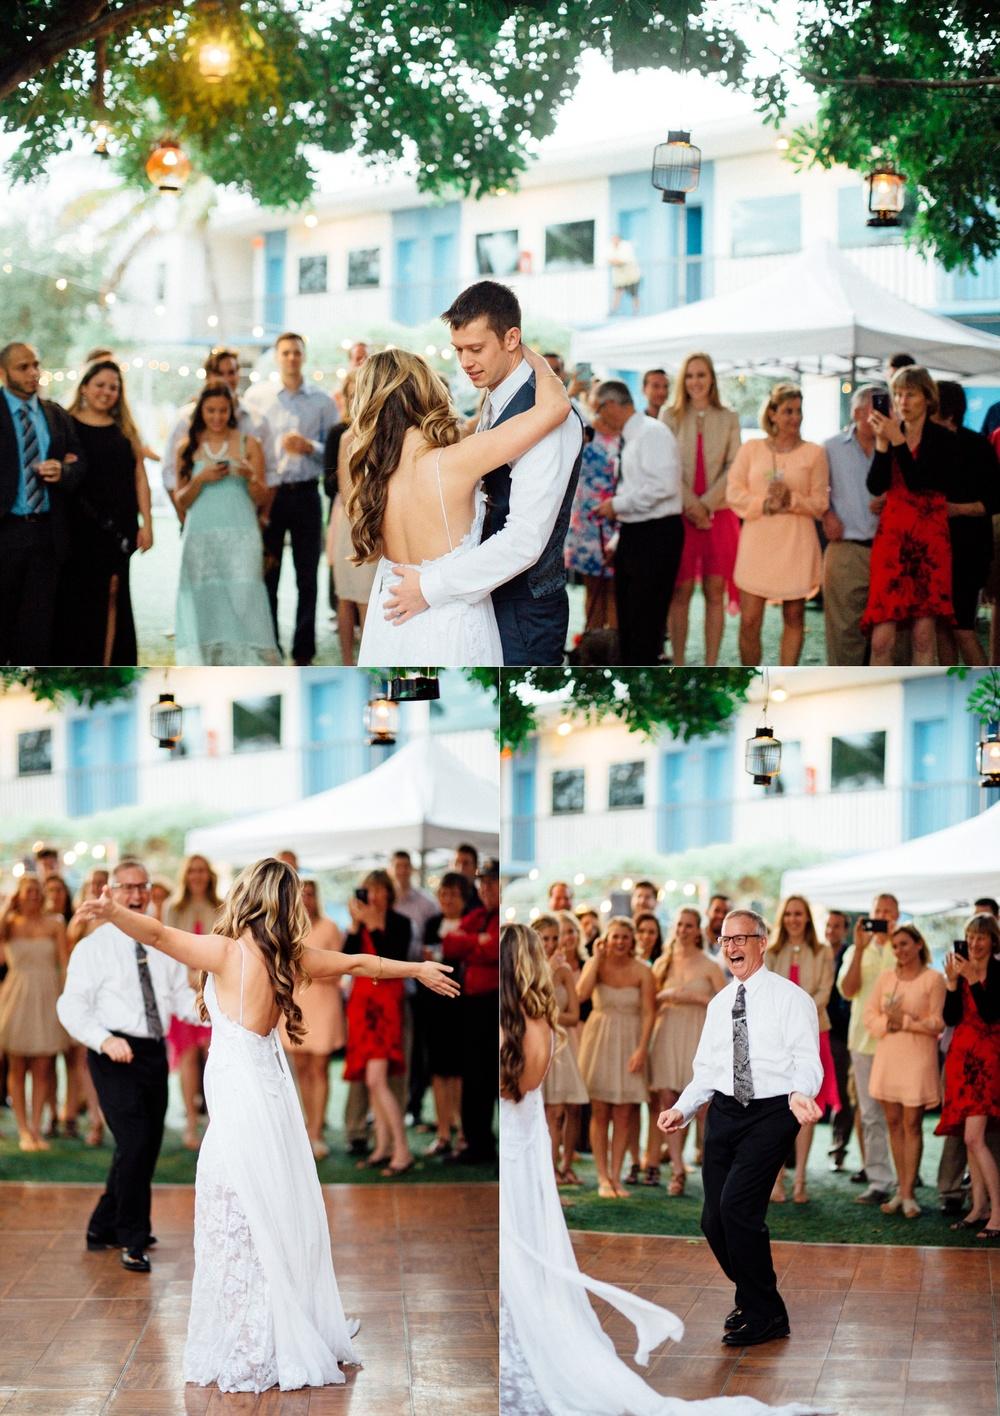 jake-and-katie-wedding-favorites-2015-54